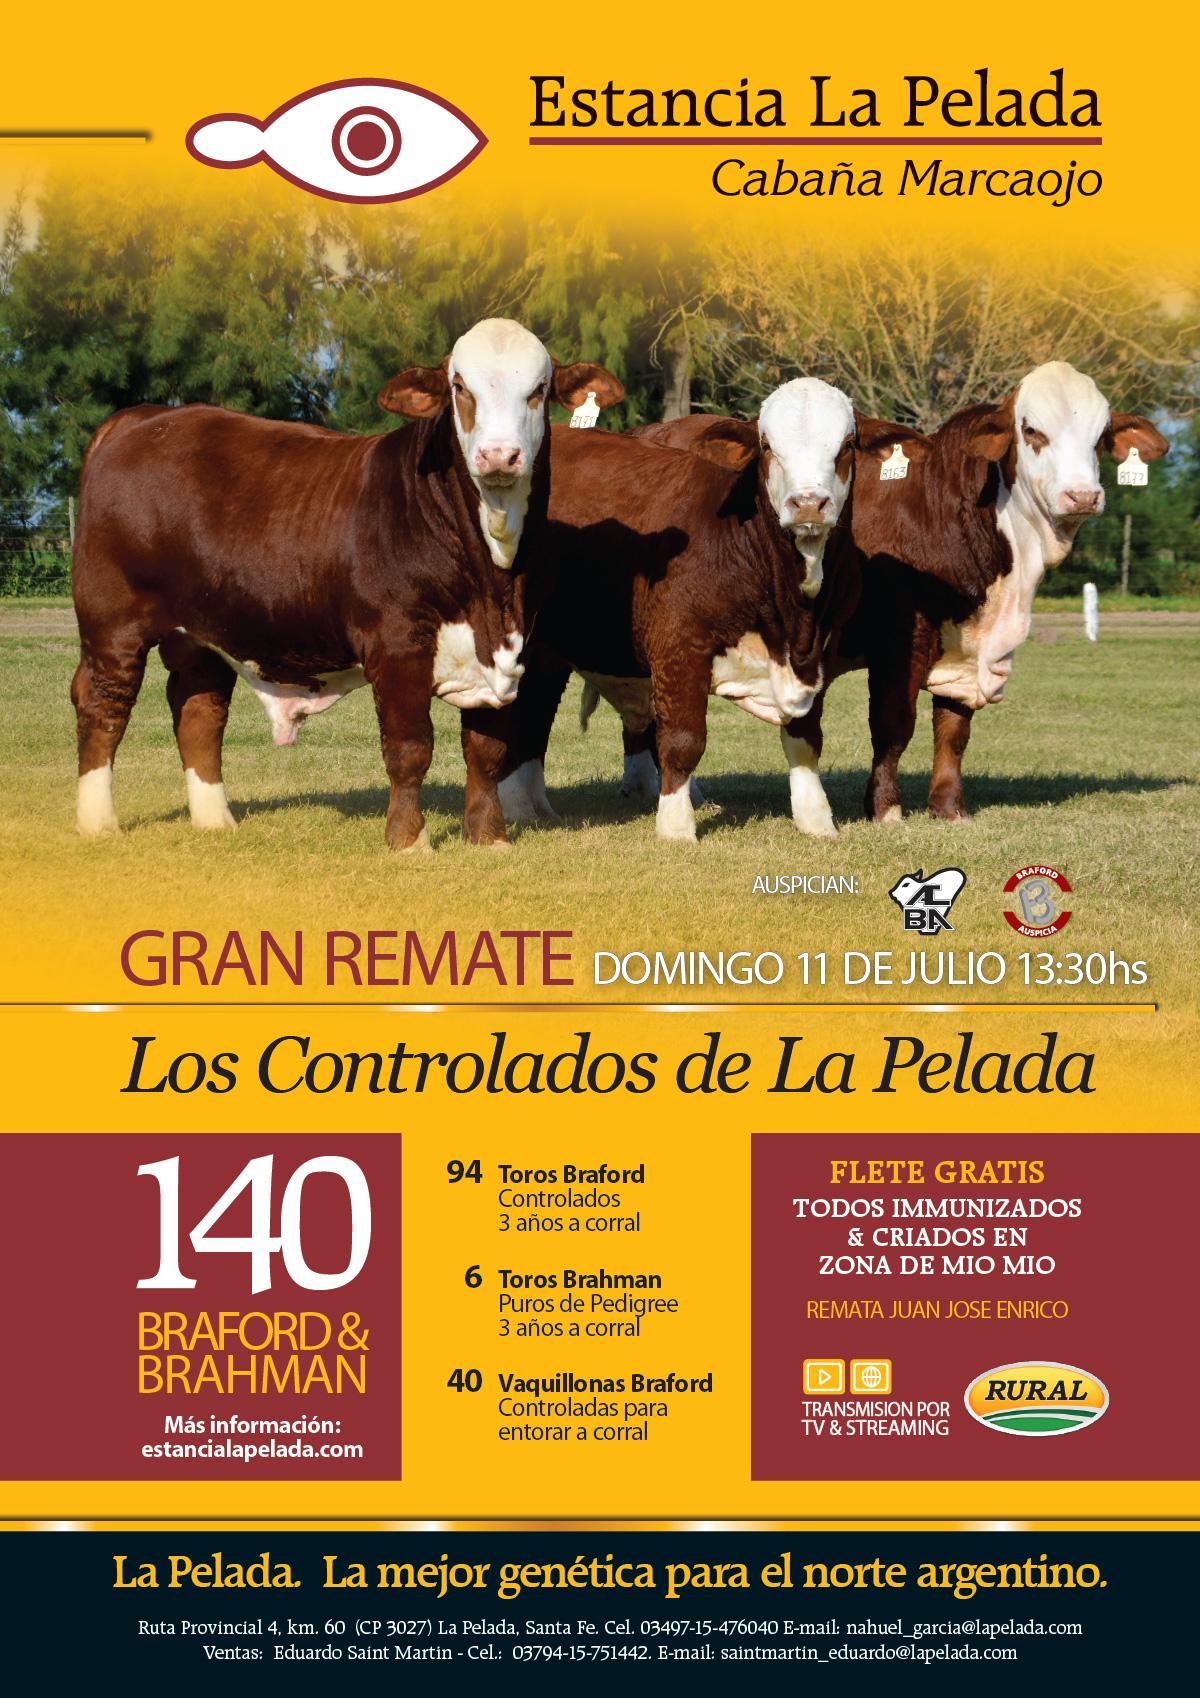 2021.07.11-Gran-Remate-La-Pelada-Marcaojo